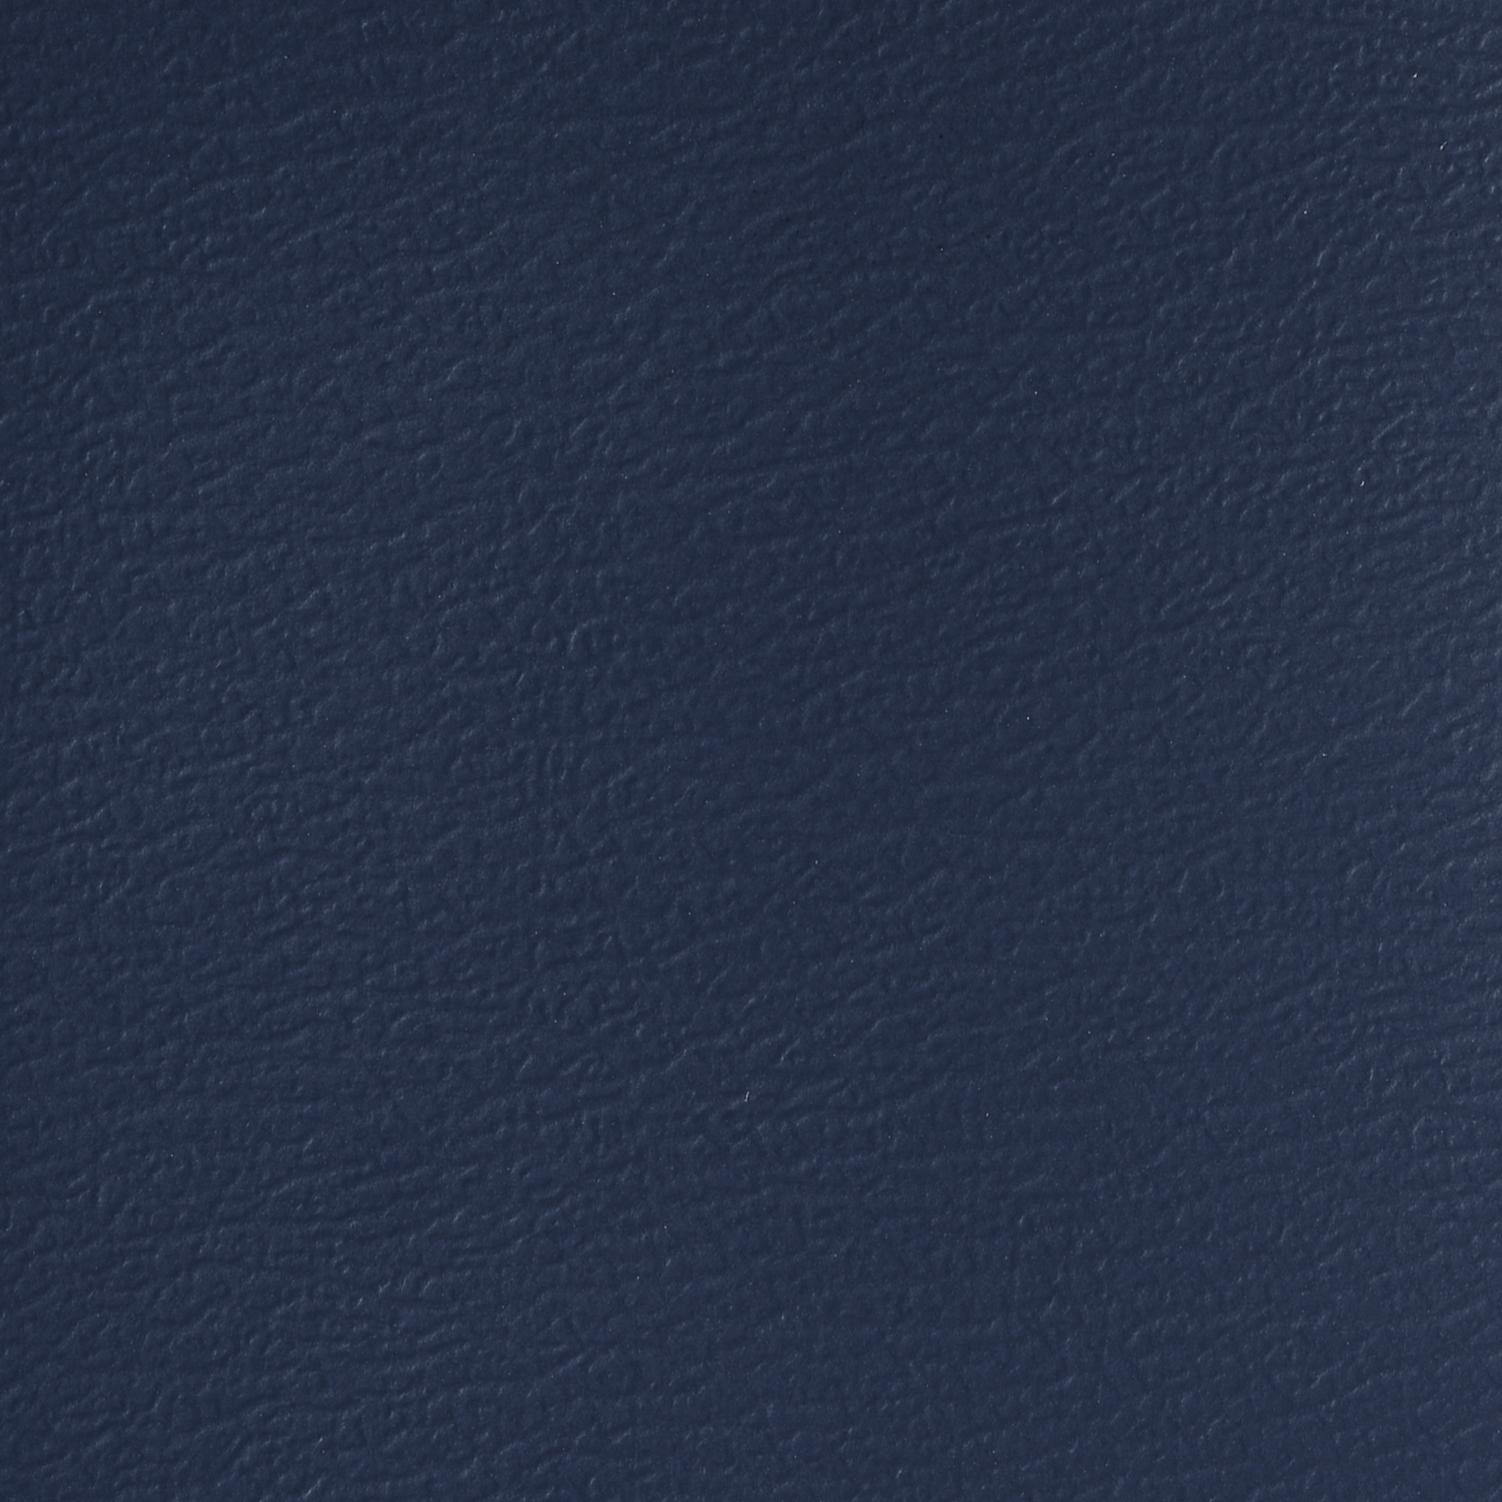 MIDNIGHT BLUE   XL-2089